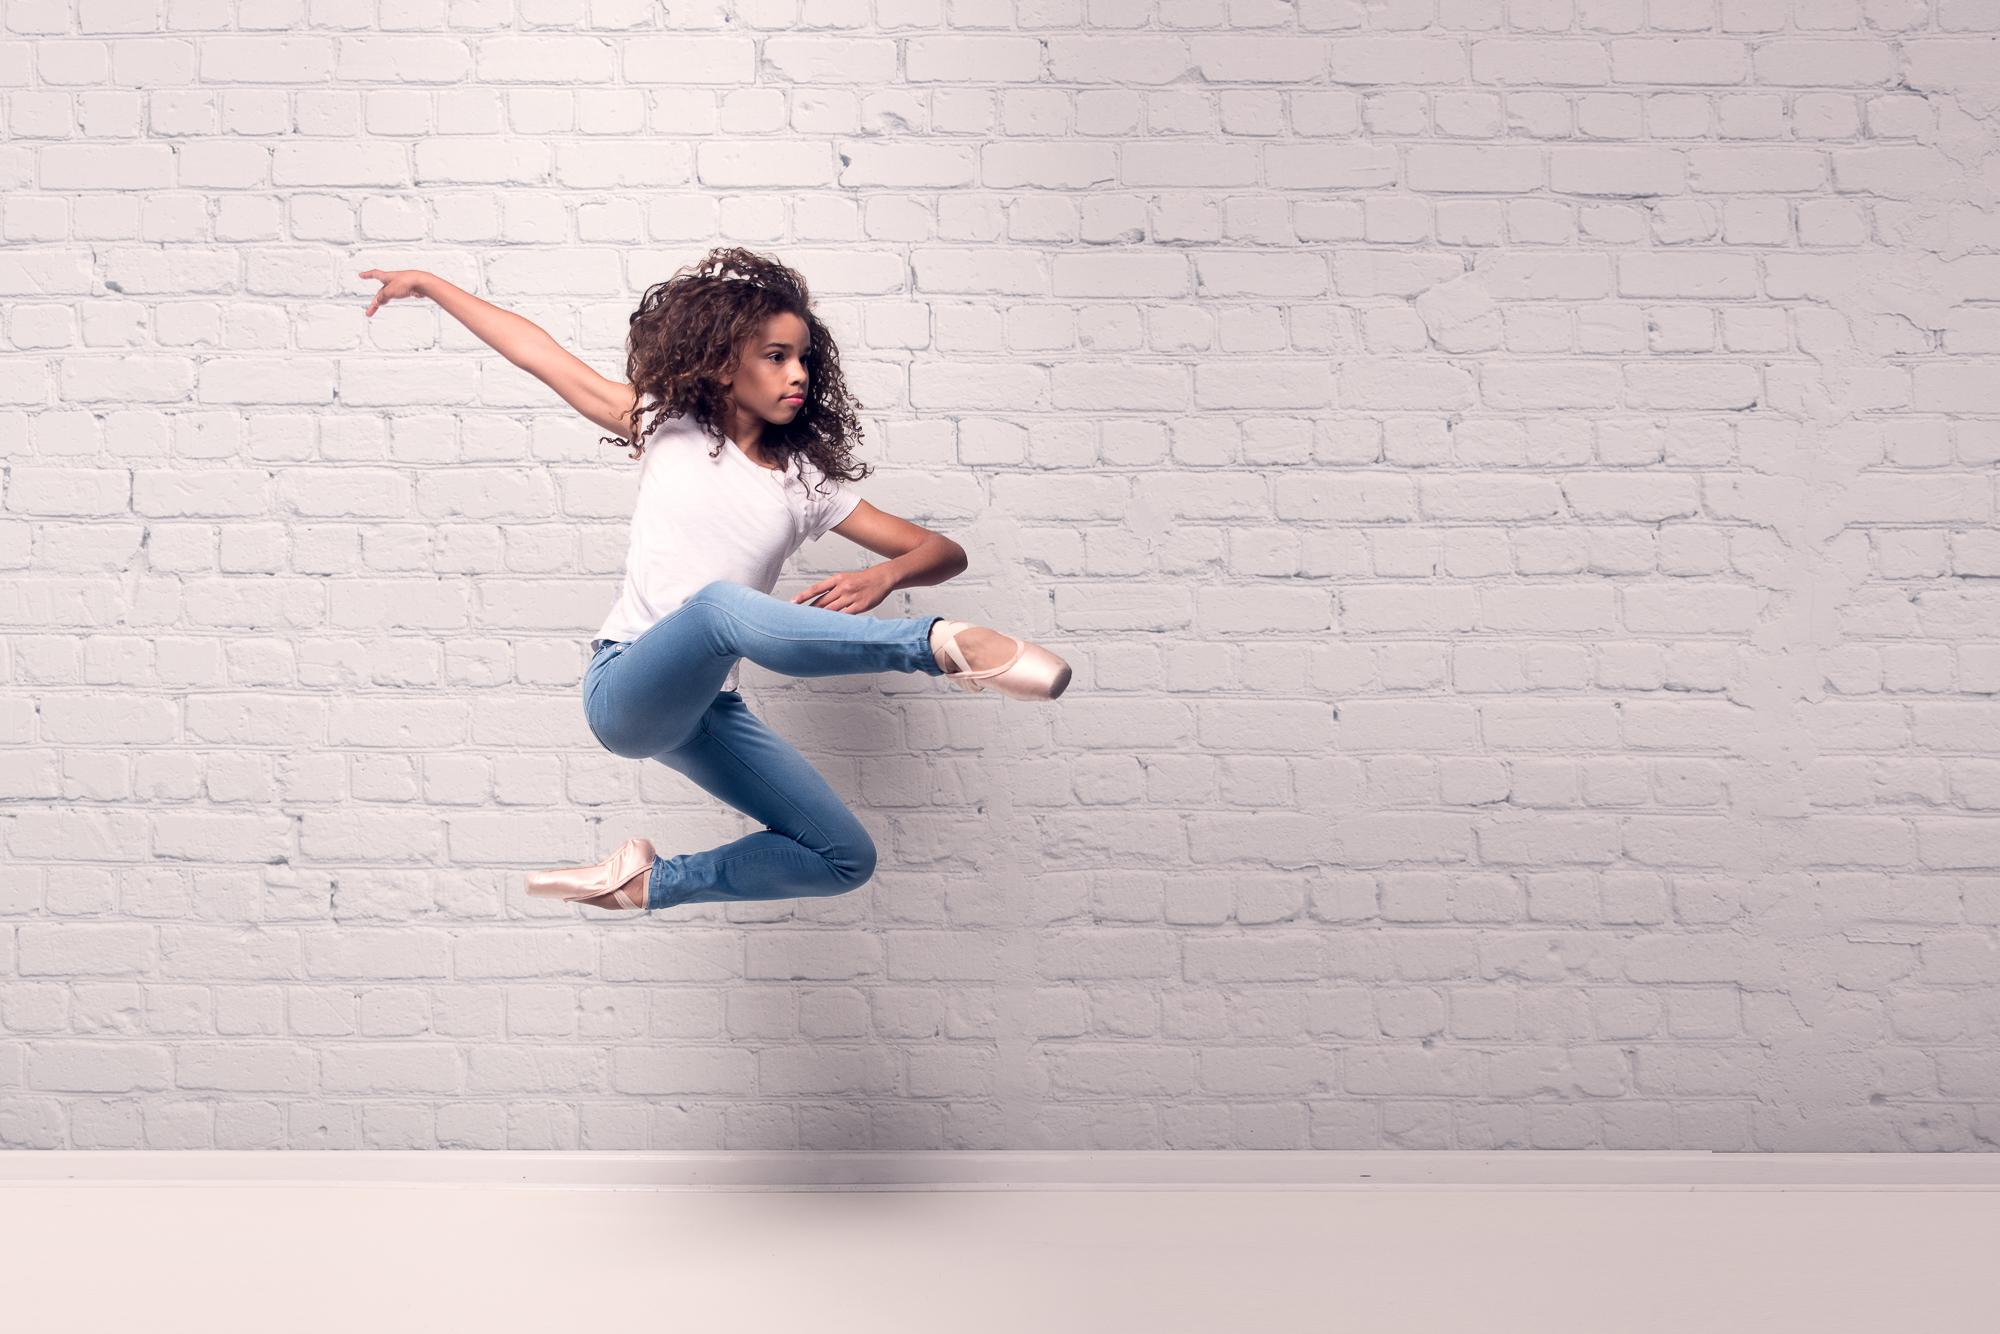 2019 atlanta dance photography-3.jpg